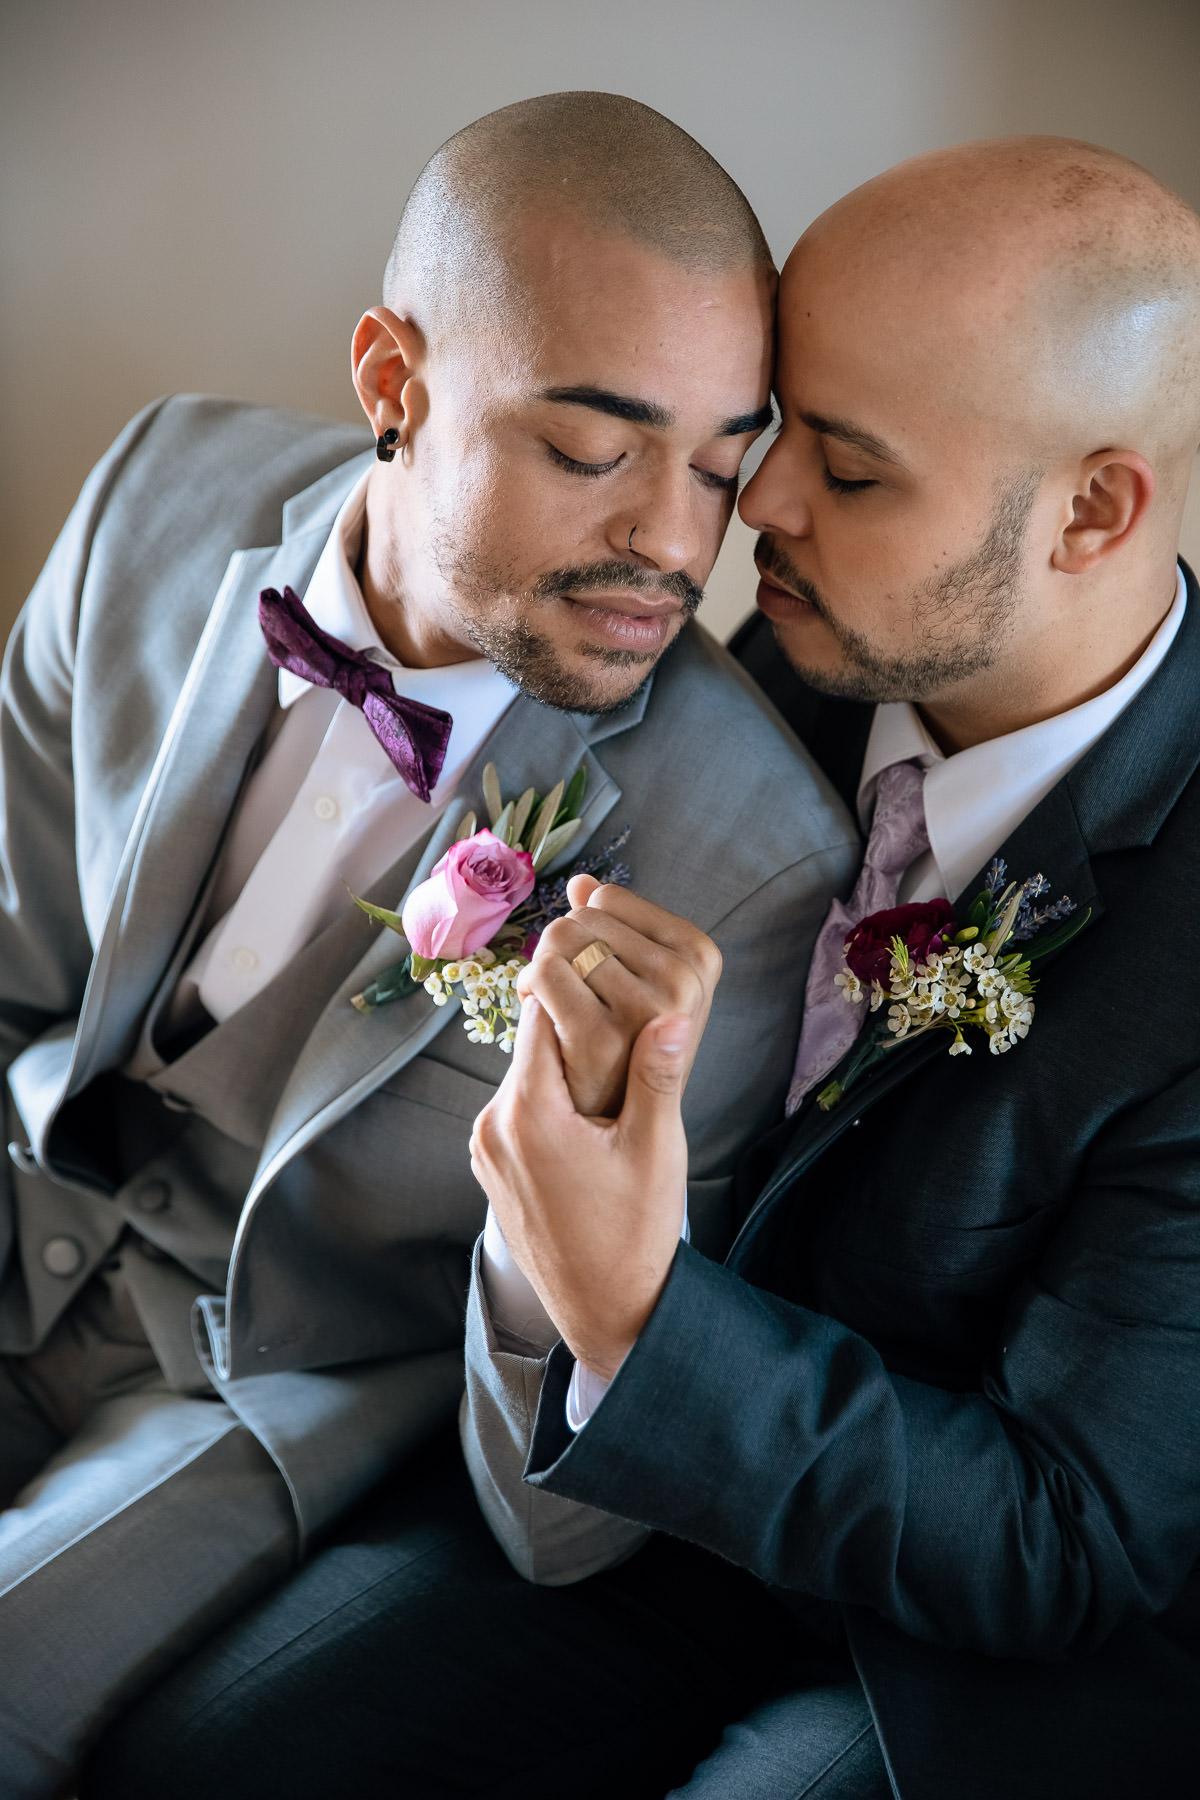 Eisenhower House, Newport, Rhode Island, Tracy Jenkins Photography, wedding, LGBTQ+, LGBT, Gay, Inclusive, Photography, Wedding photography, groom, grooms, snuggle